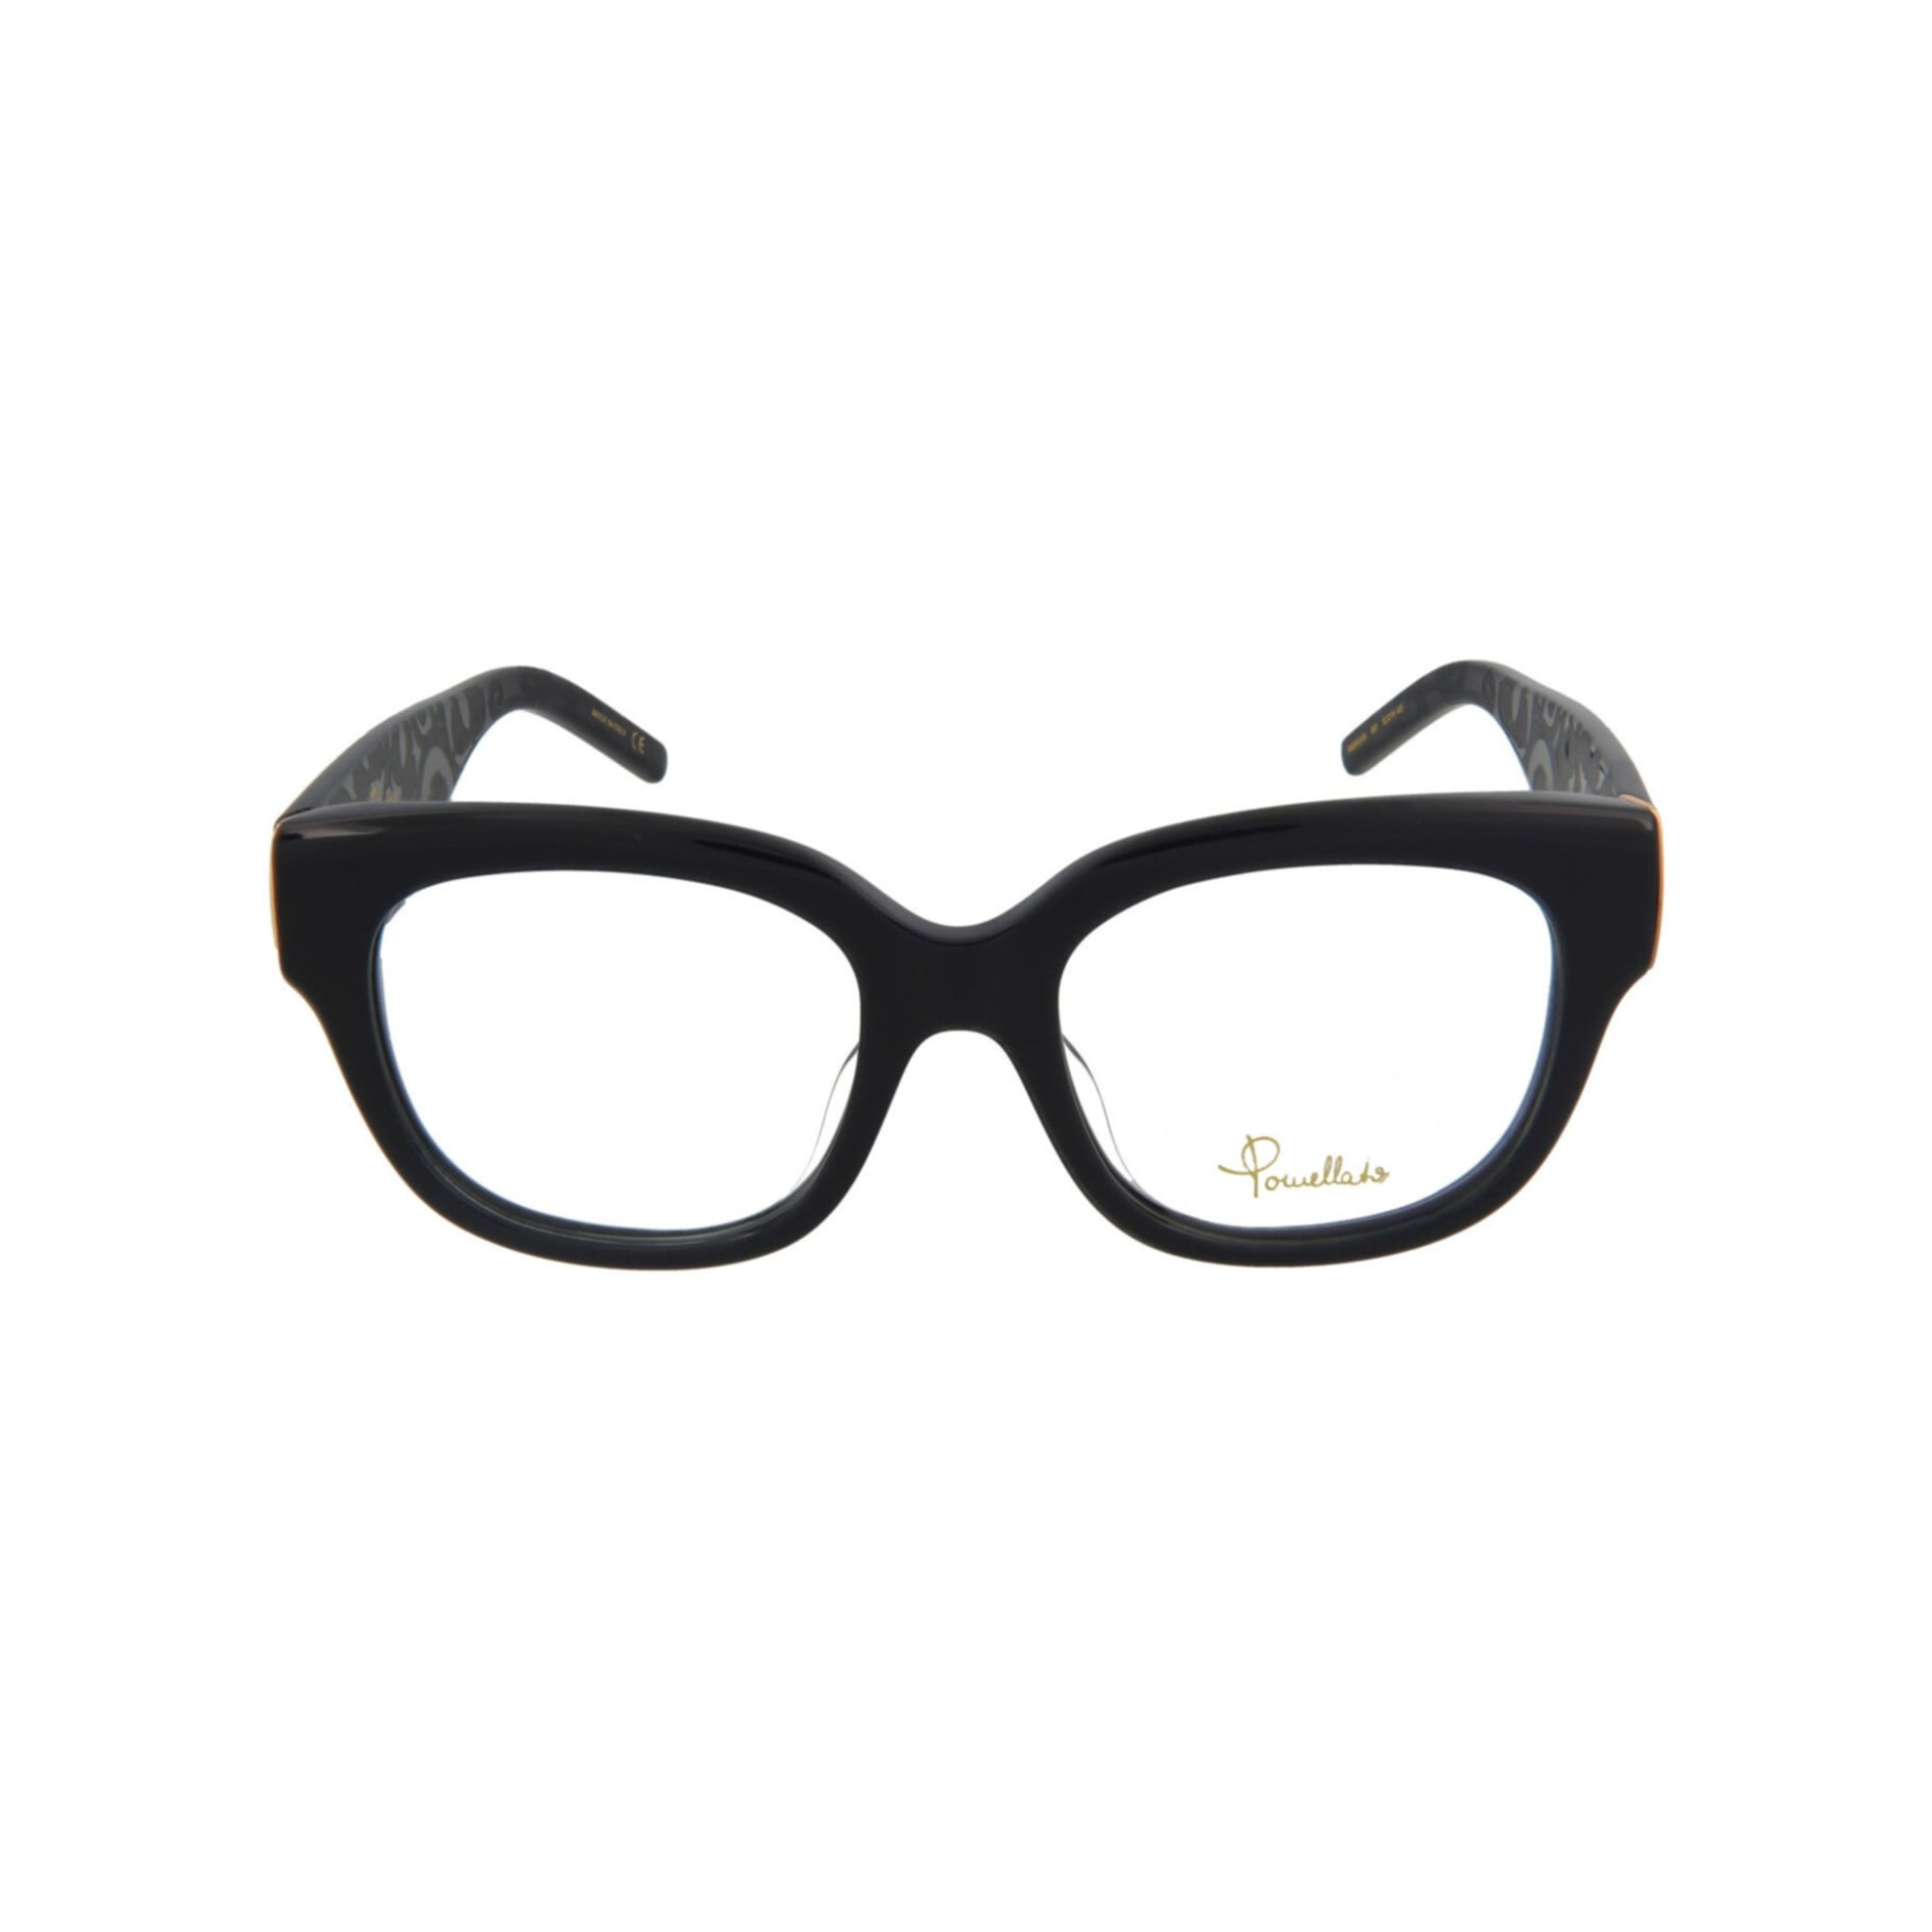 Eyeglass Frames POMELLATO Blue, navy, turquoise